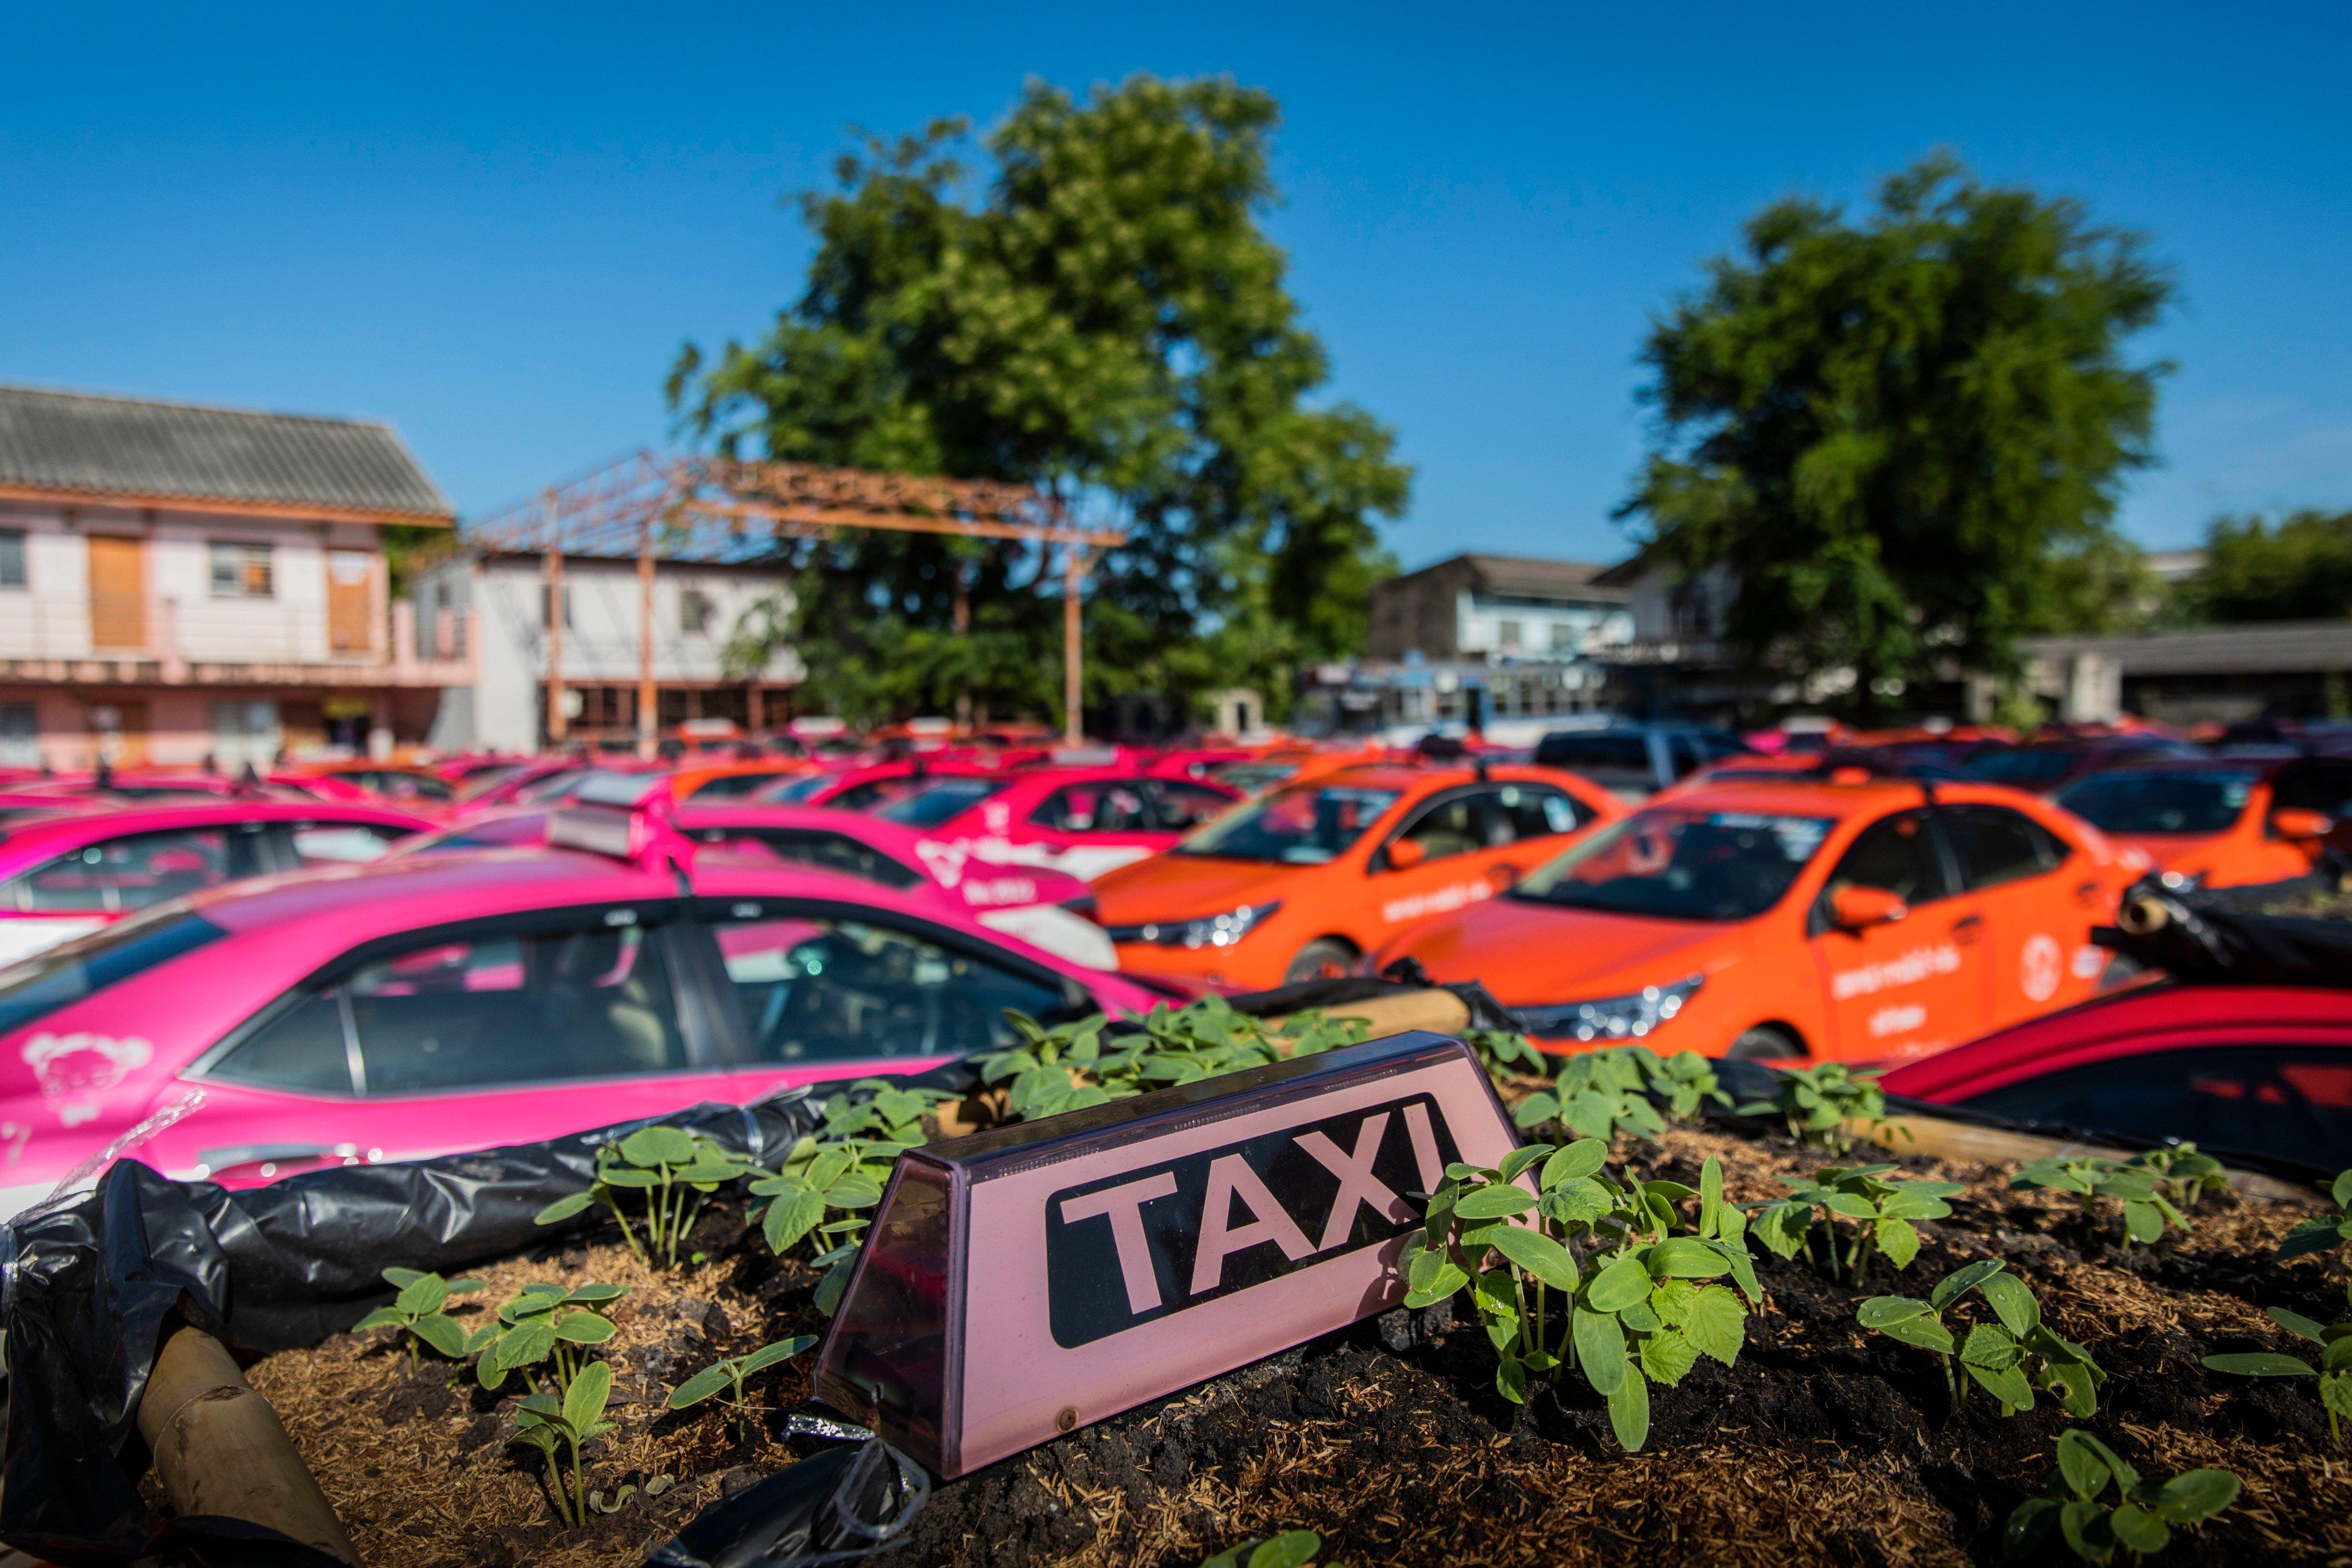 Bangkok's Taxis Turn Into Gardens As Low Tourism Bites